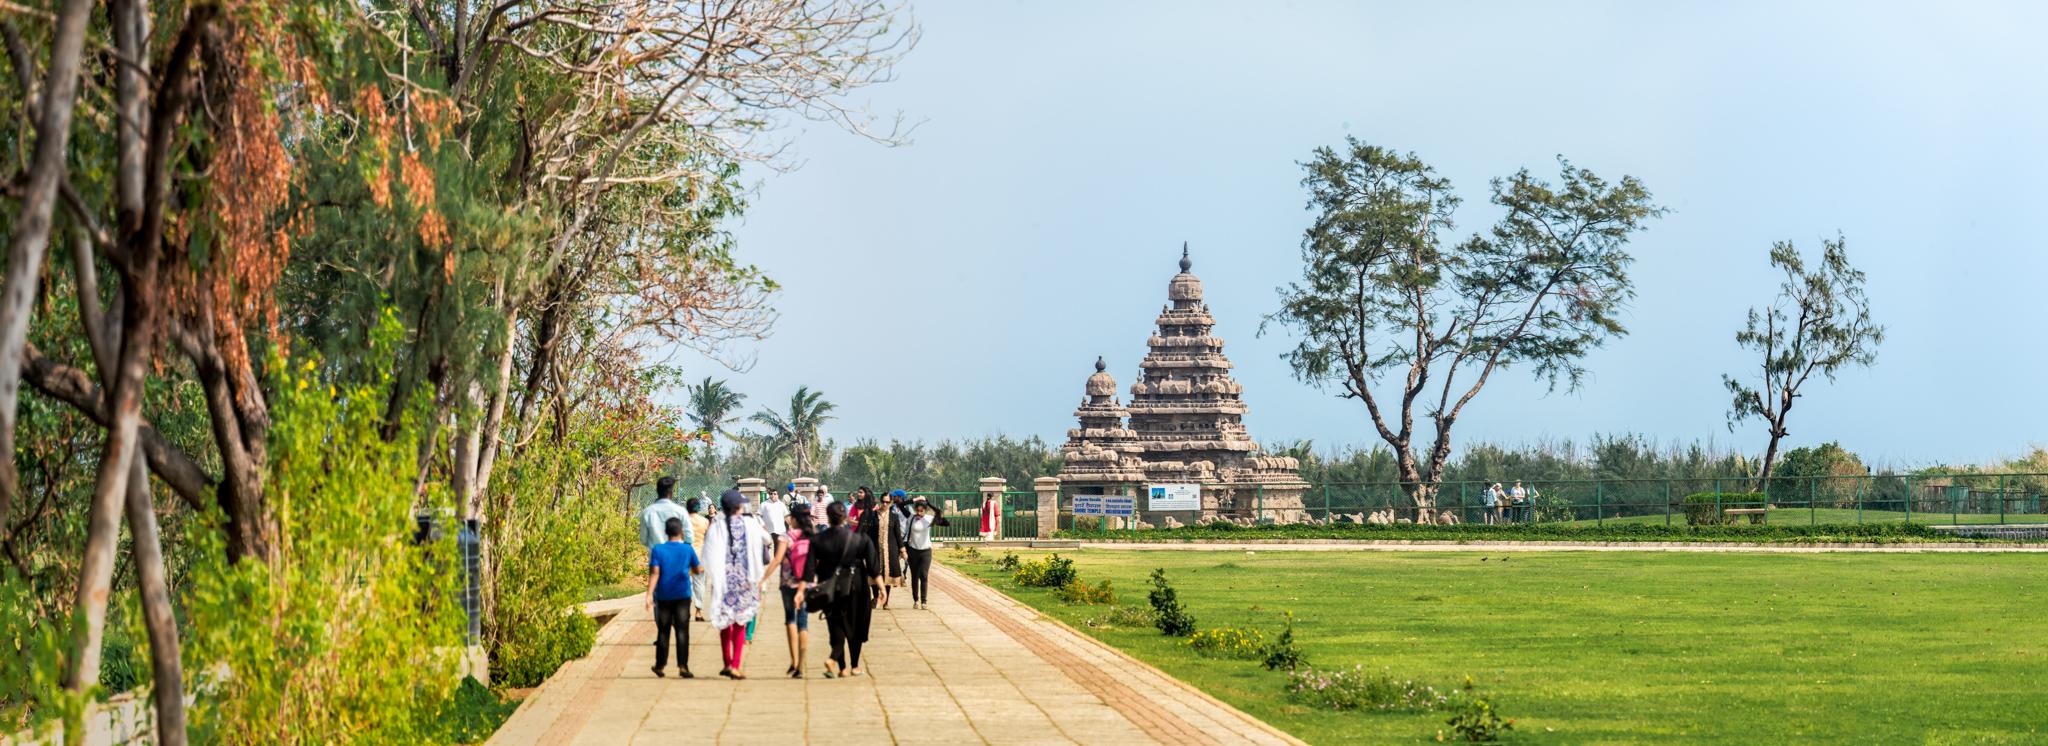 2016-12-22 - Mahabalipuram - 099